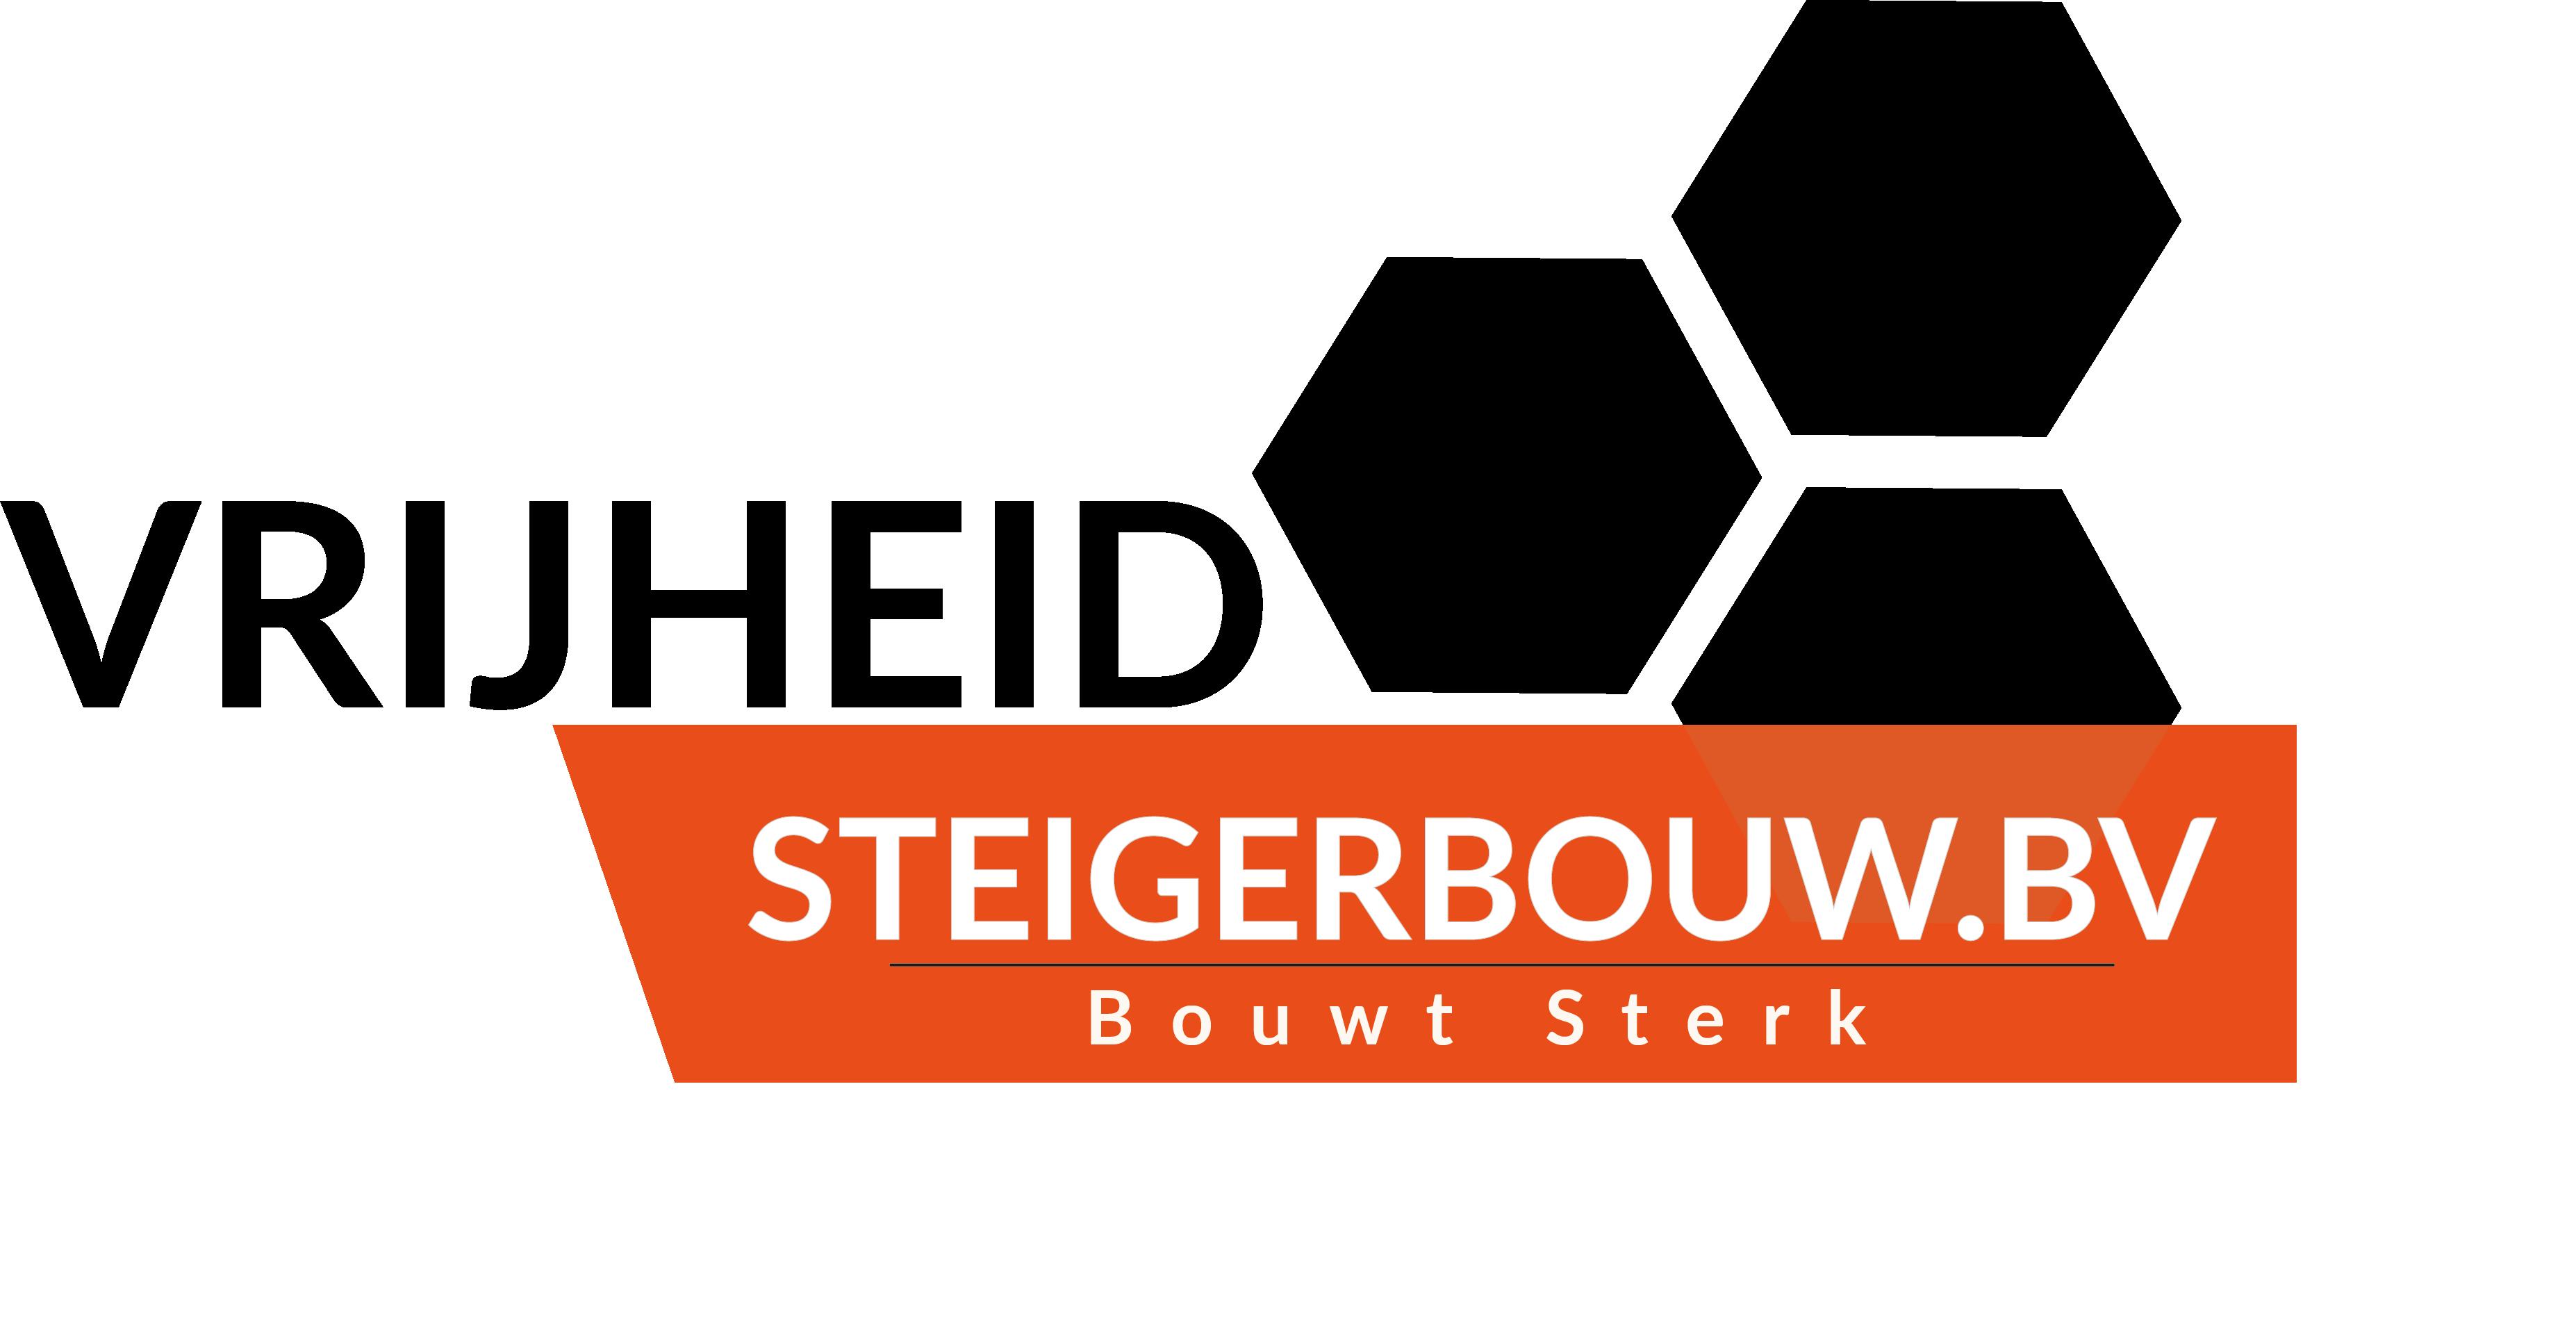 Vrijheid Steigerbouw B.V.